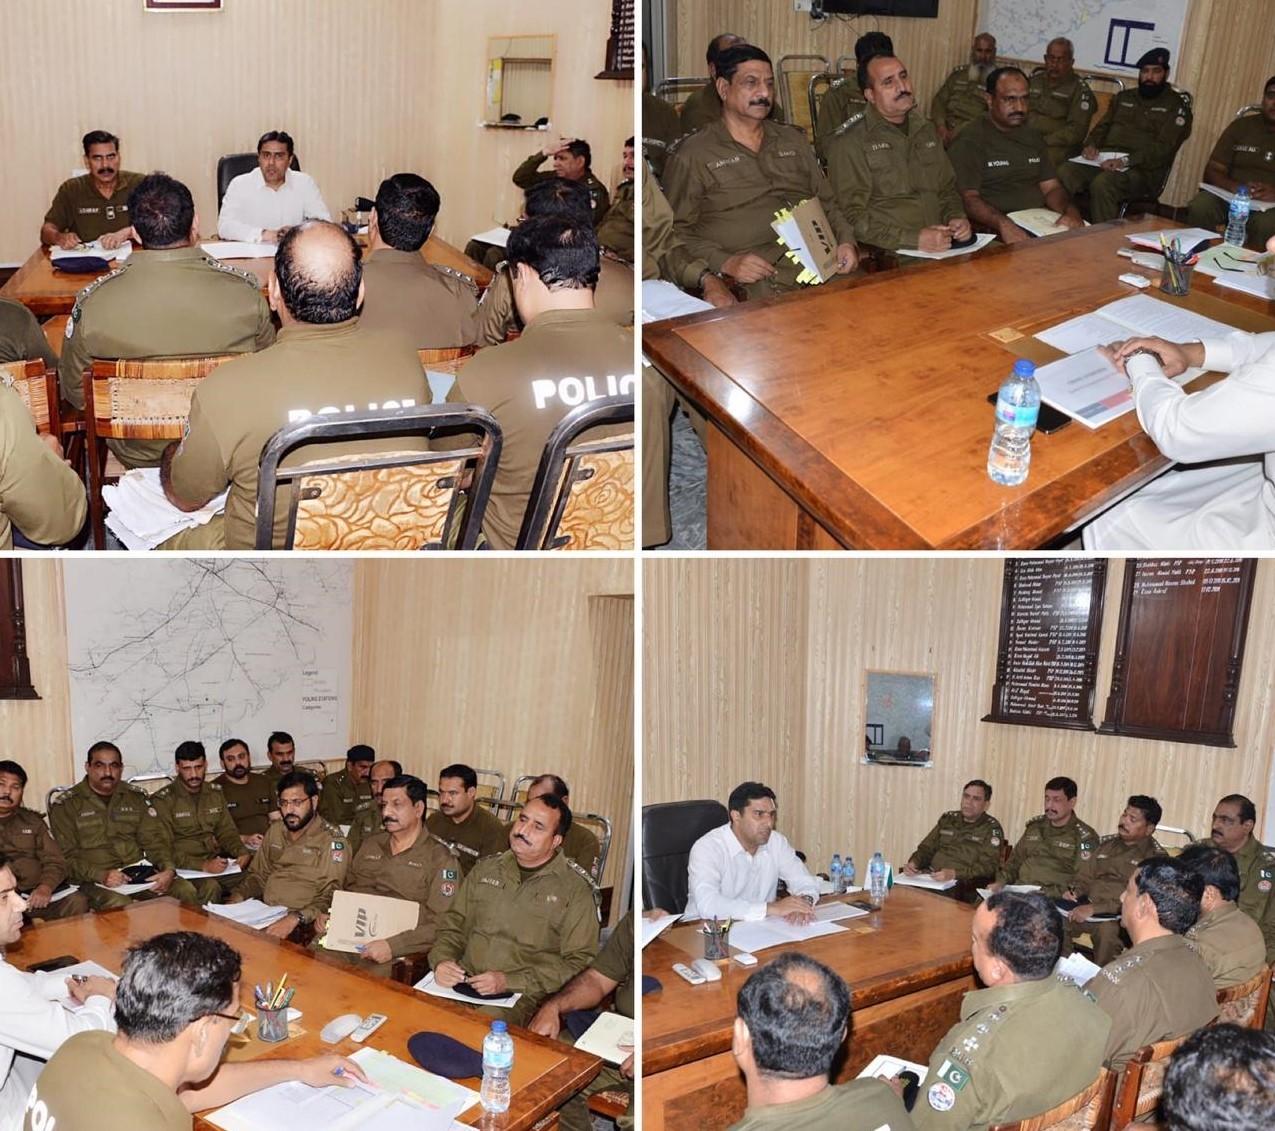 Fsd police-crime meeting